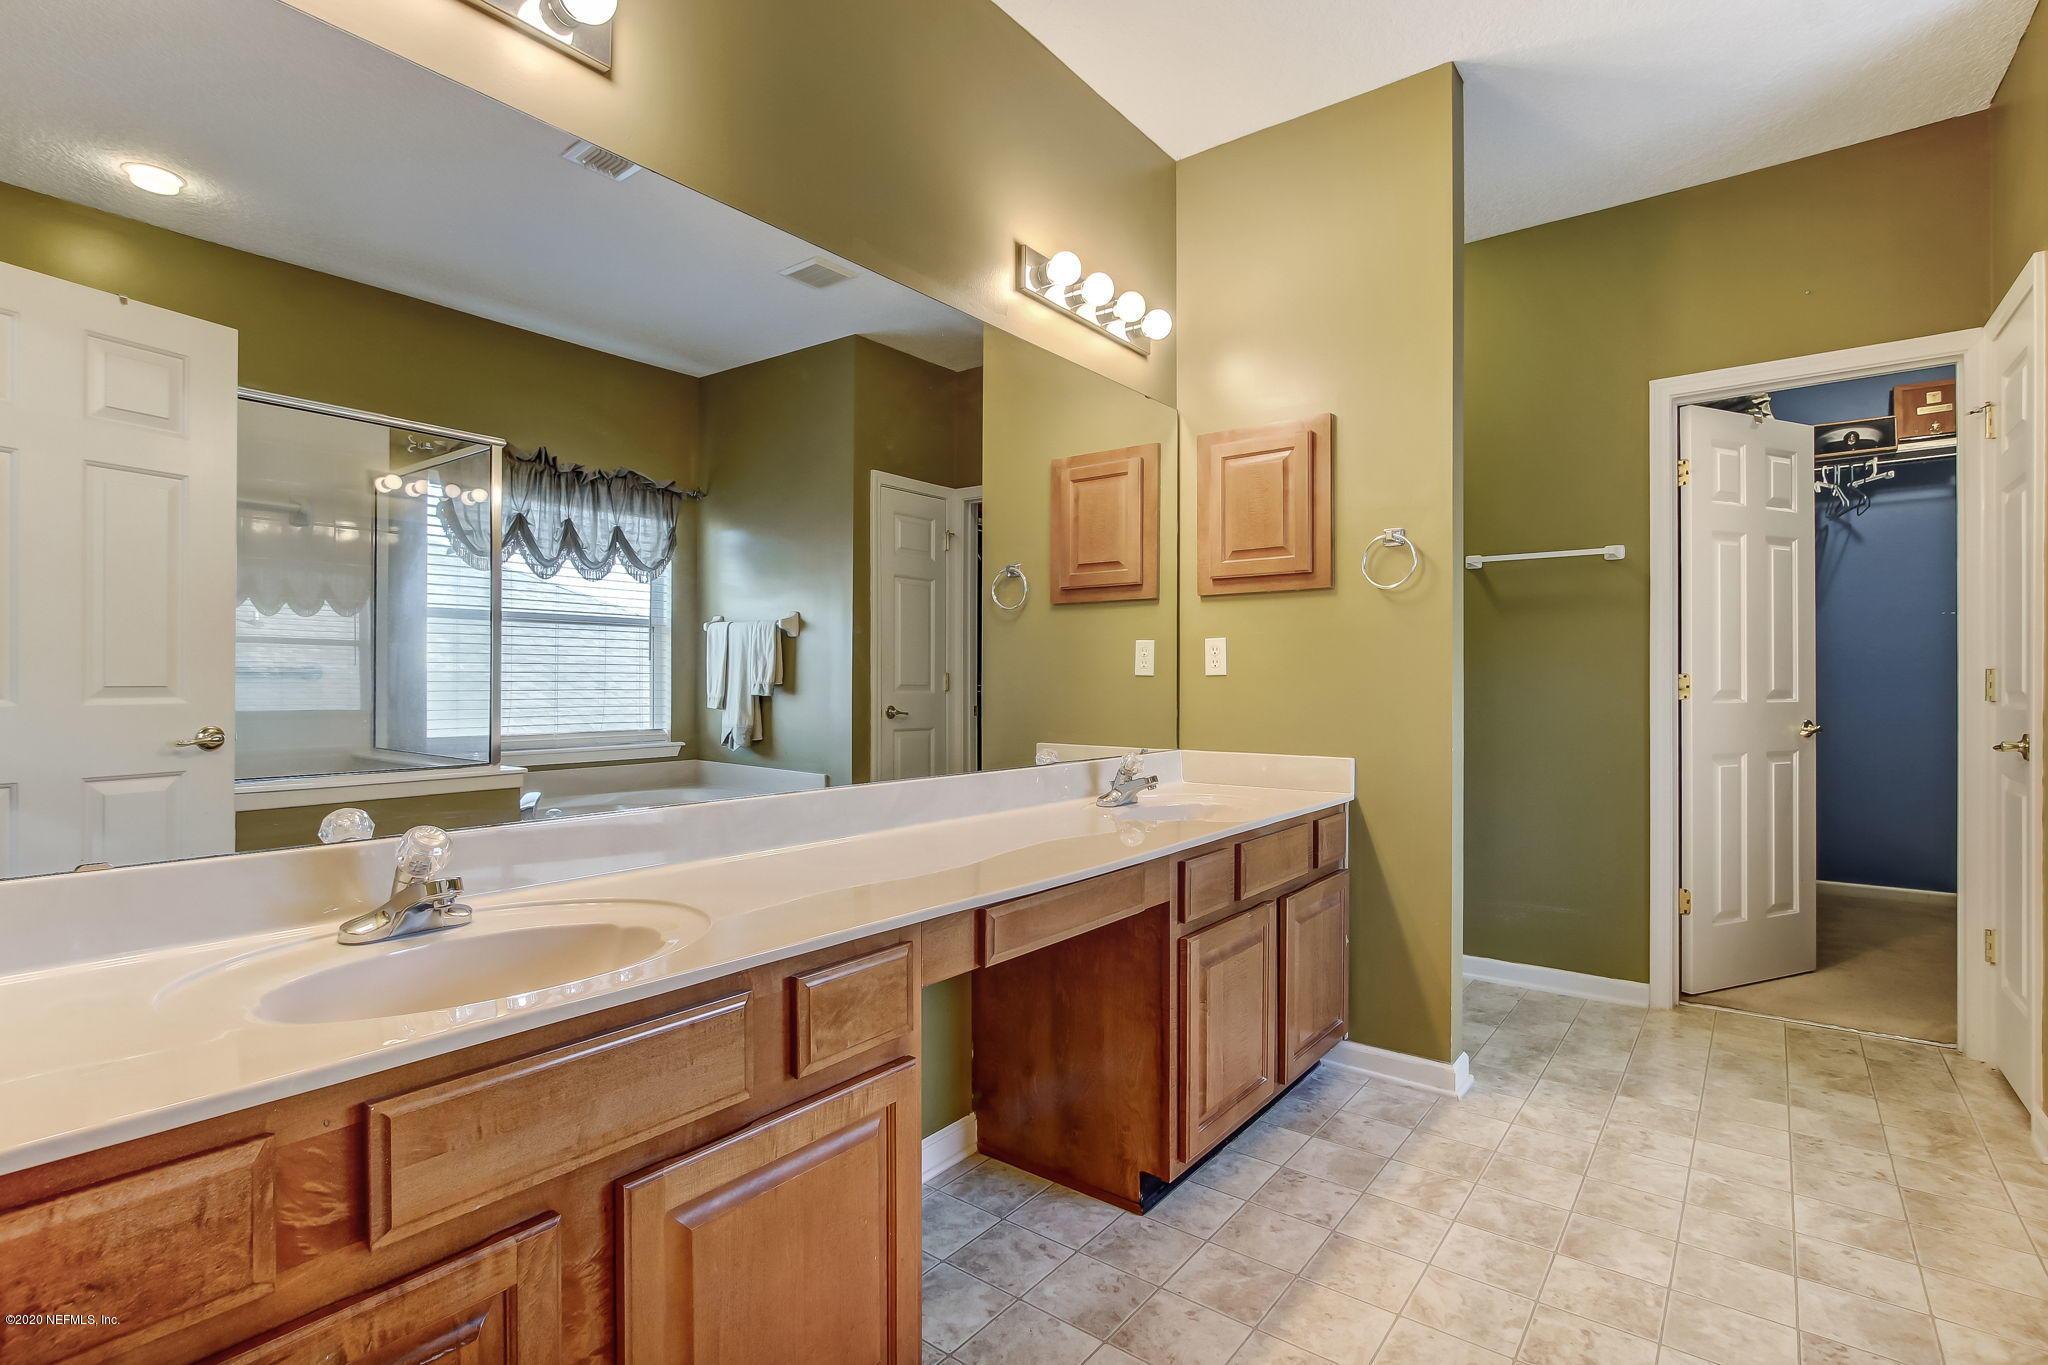 3179 STONEBRIER RIDGE, ORANGE PARK, FLORIDA 32065, 5 Bedrooms Bedrooms, ,4 BathroomsBathrooms,Residential,For sale,STONEBRIER RIDGE,1013566